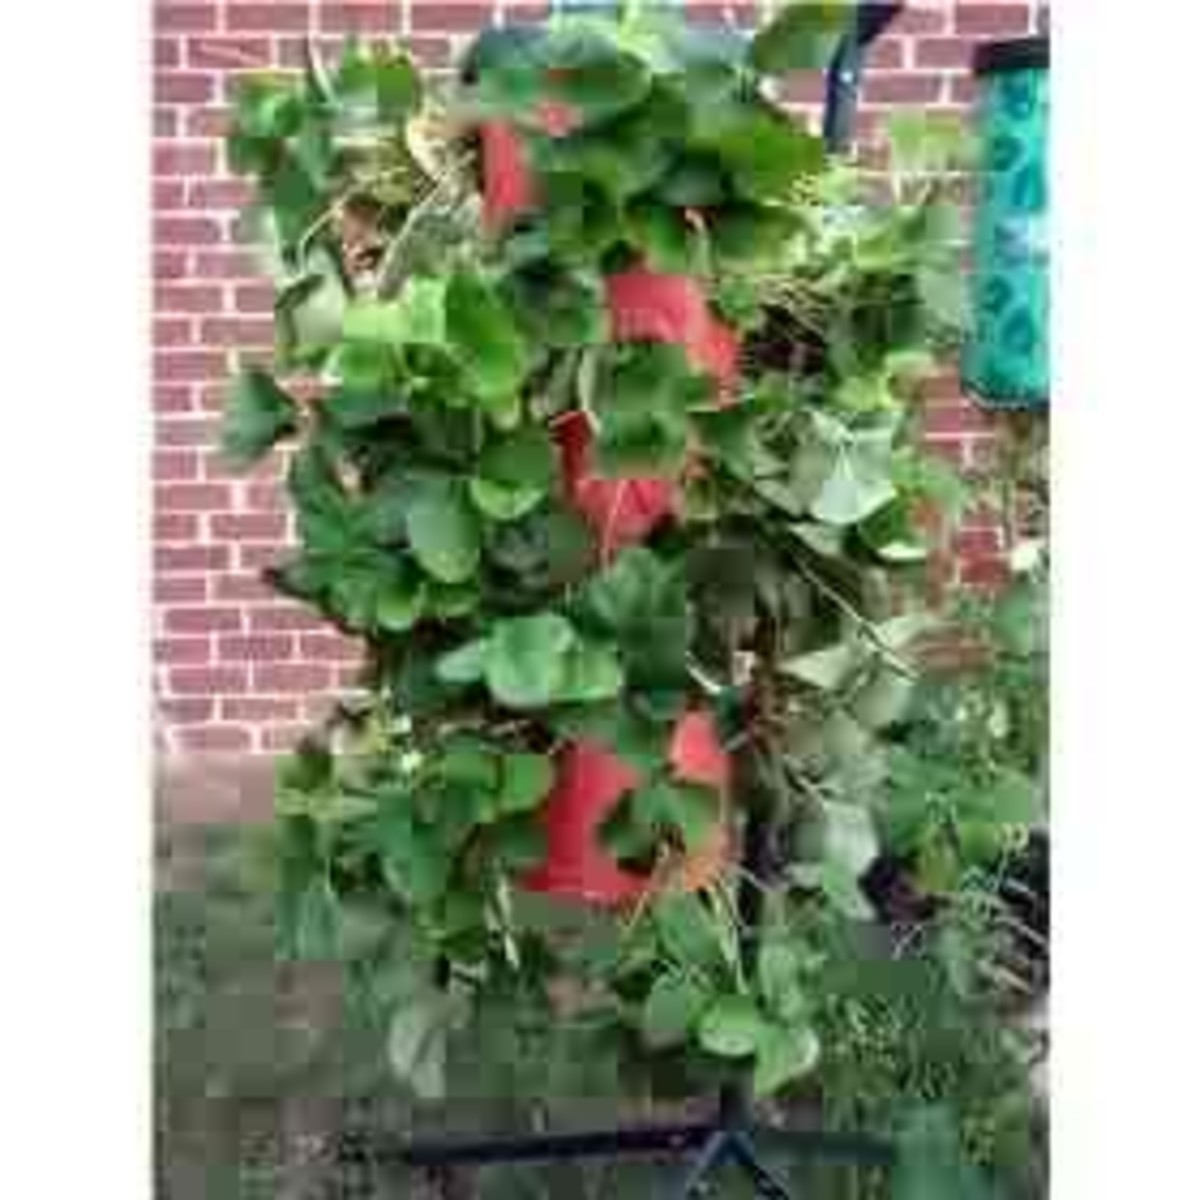 Vertical strawberries